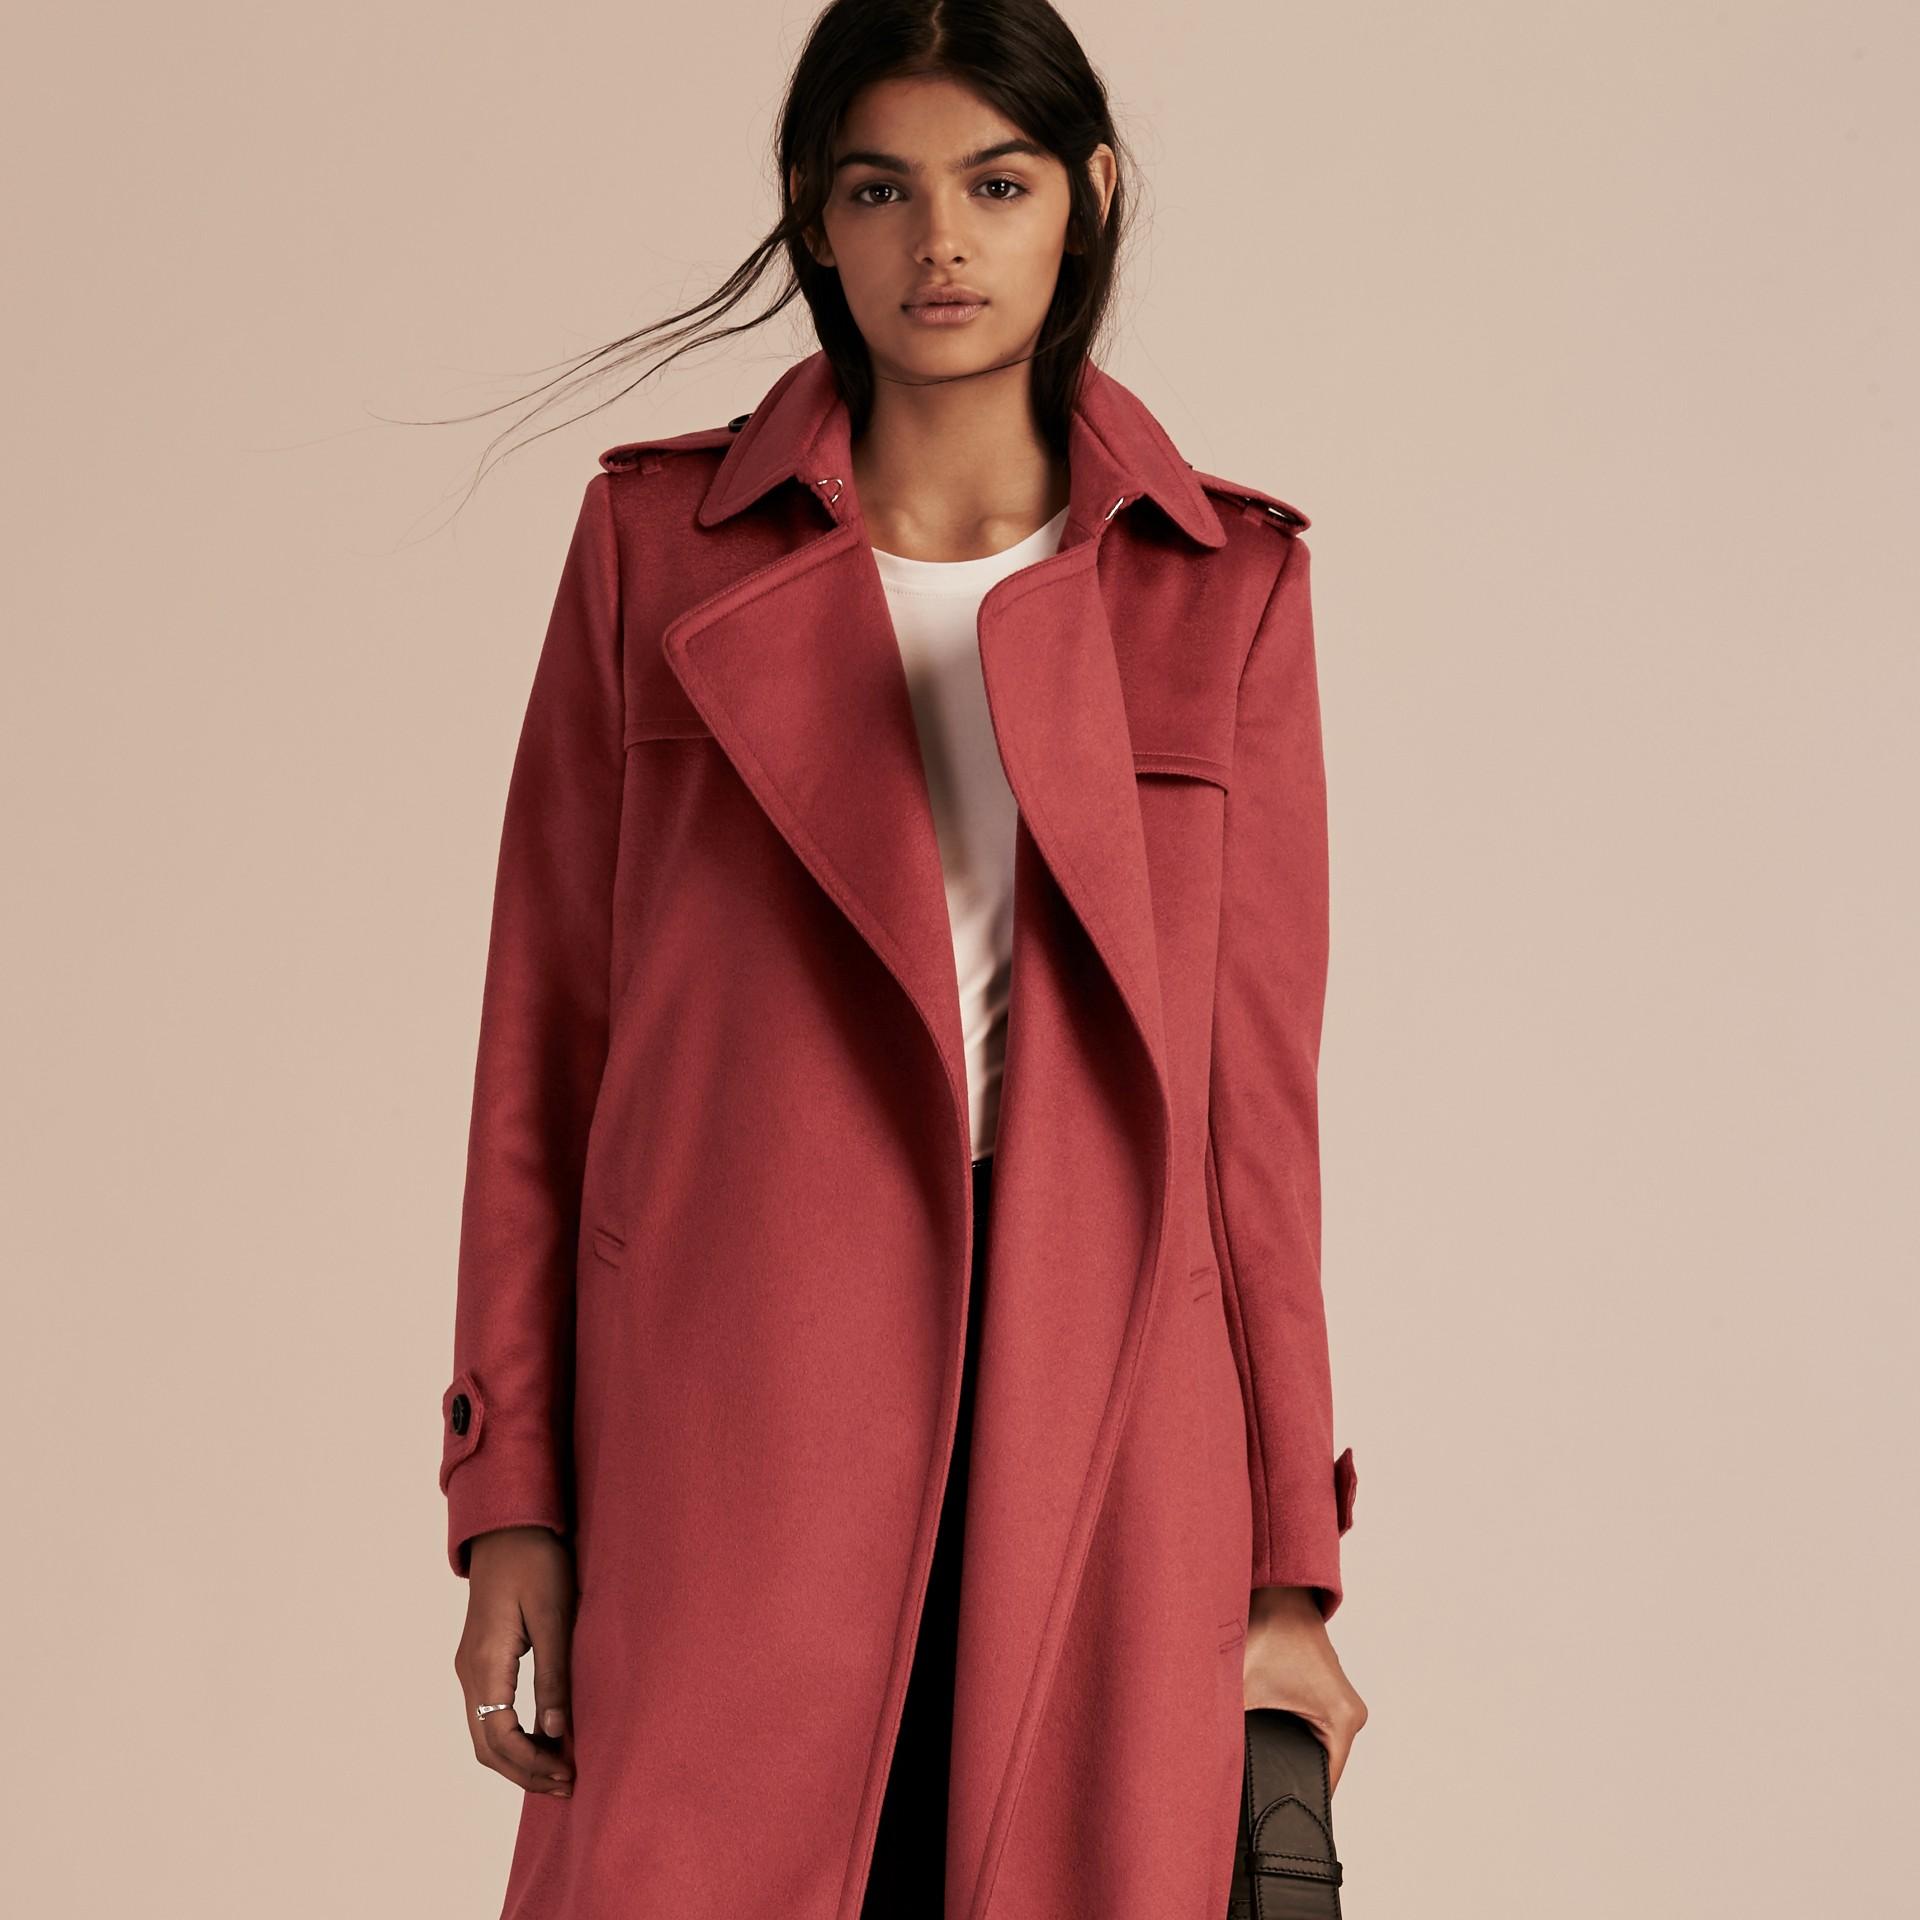 Rose pivoine cendrée Trench-coat portefeuille en cachemire Rose Pivoine Cendrée - photo de la galerie 7